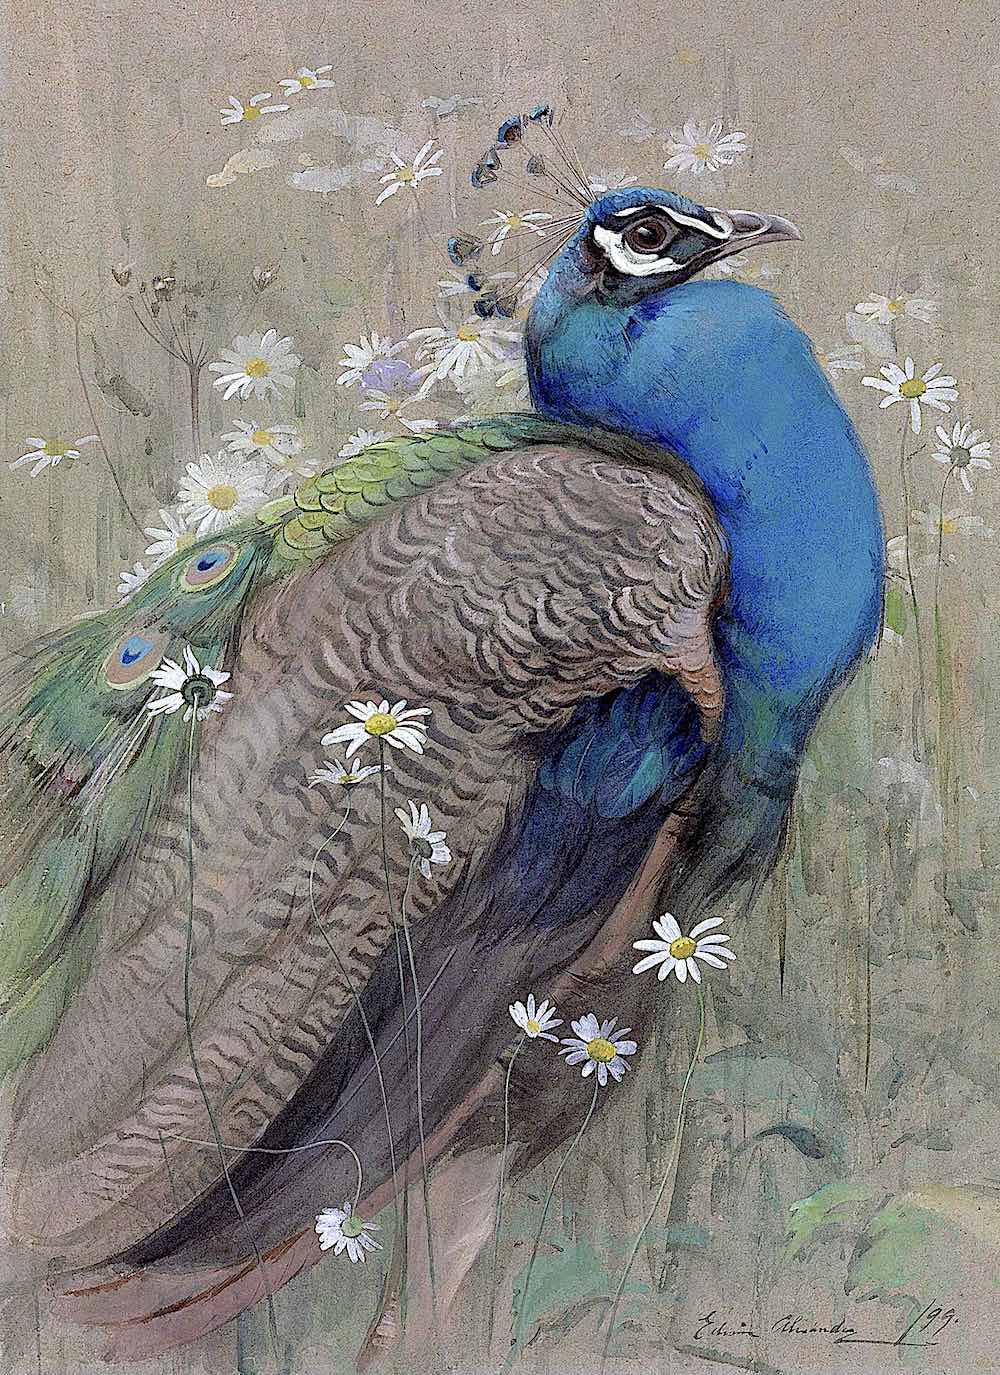 Edwin John Alexander art 1899, a large blue bird in a wild field with daisy flowers